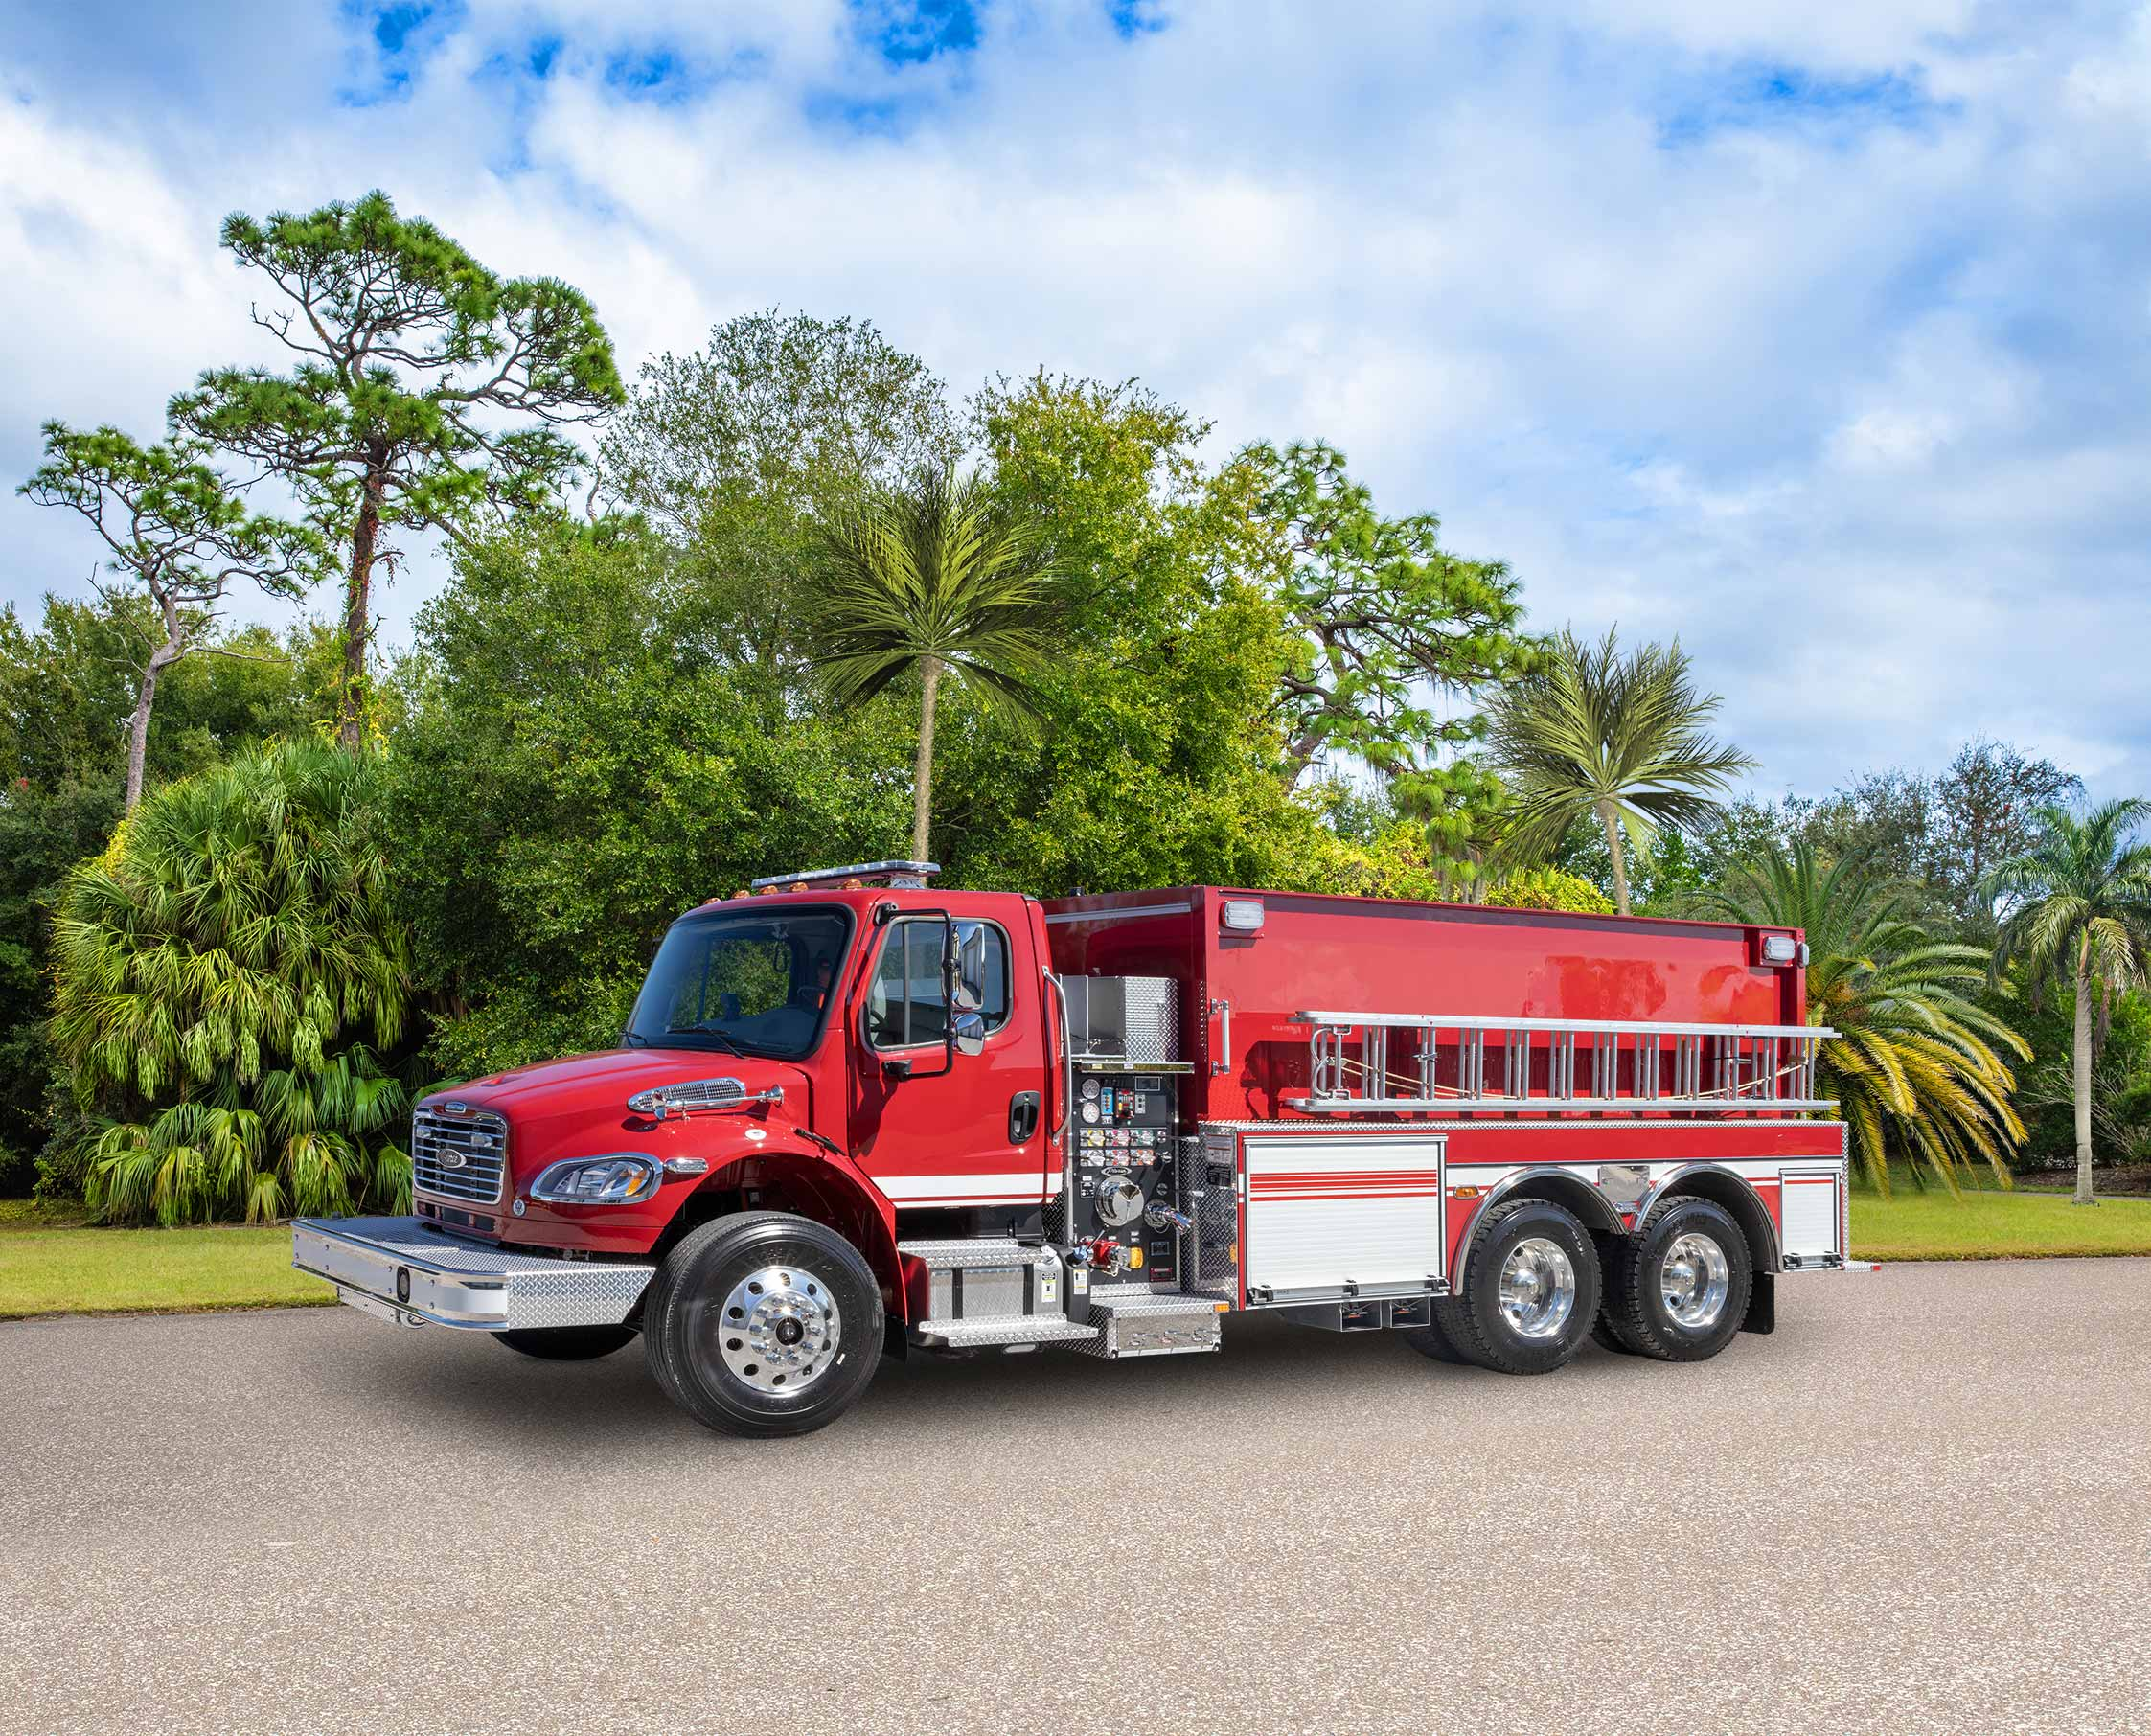 Sturgeon County Fire Department - Tanker